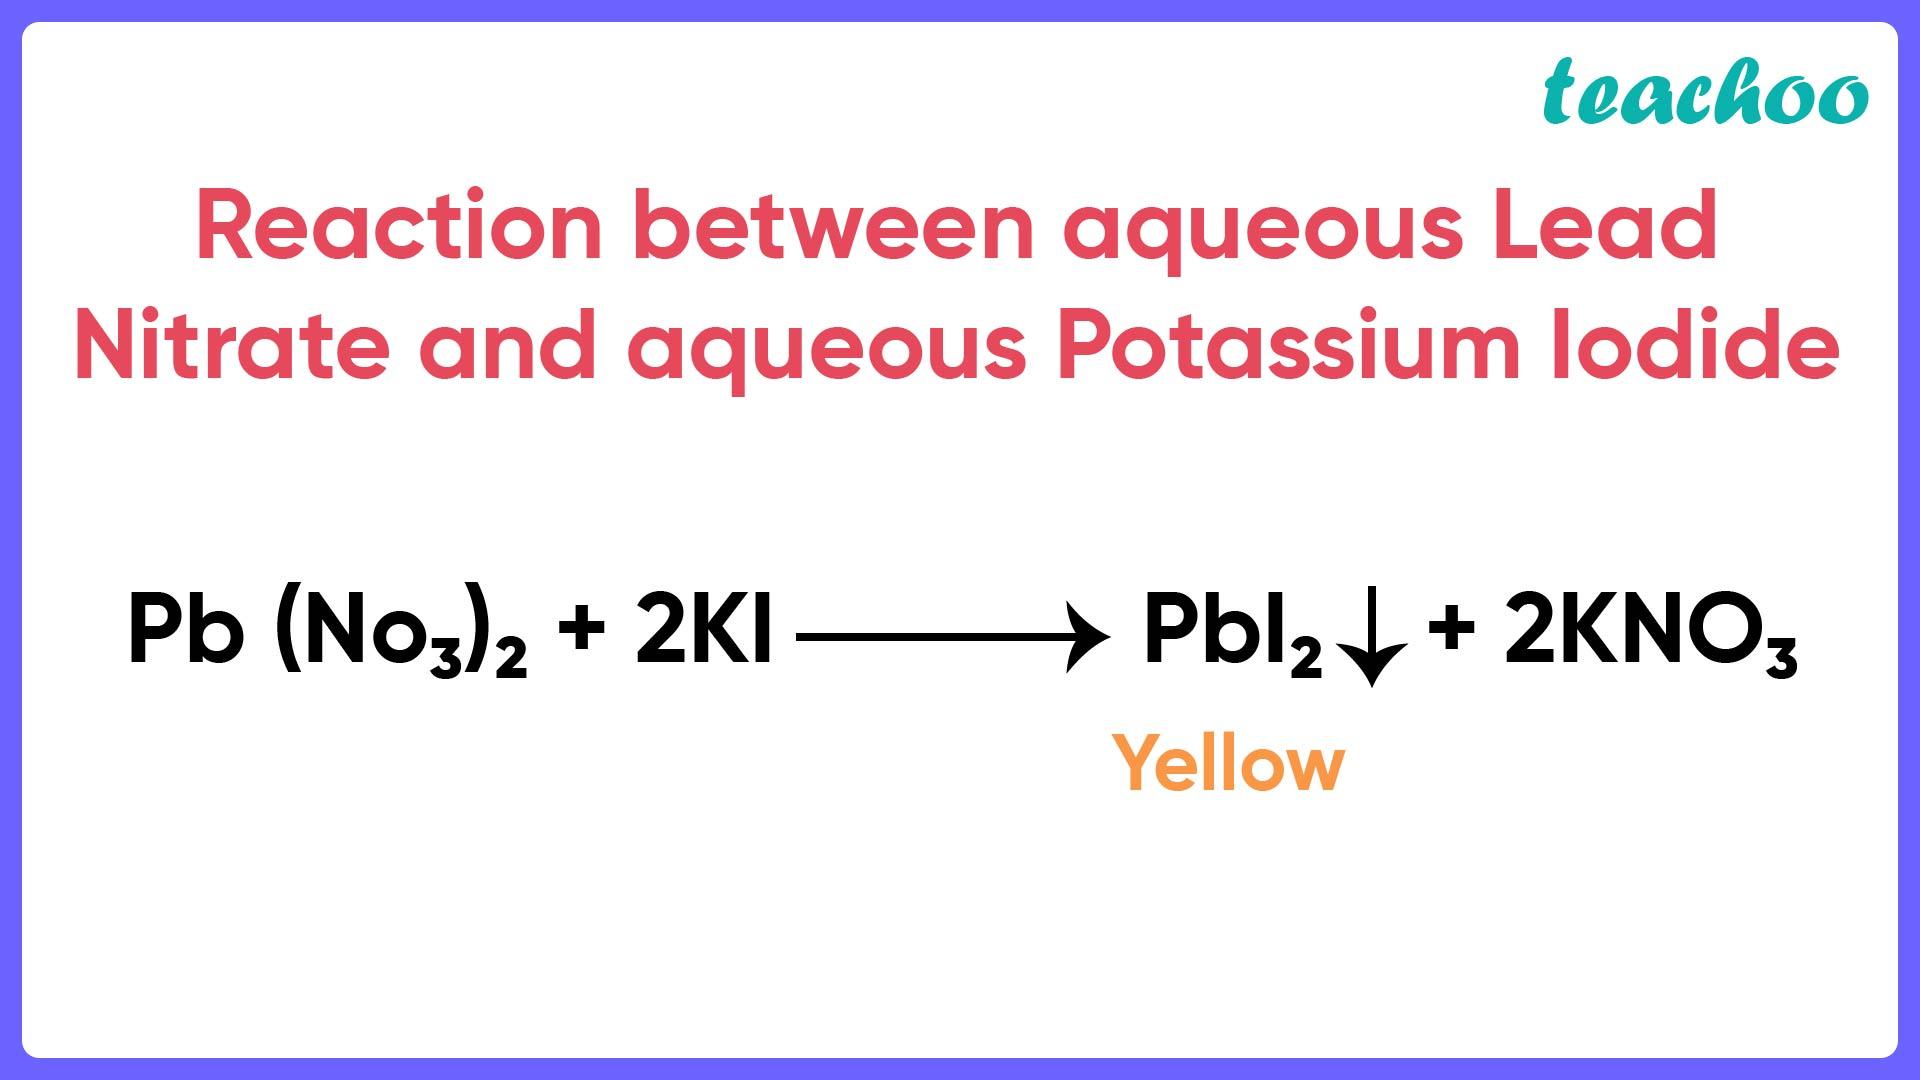 Reaction between aqueous Lead Nitrate and aqueous Potassium Iodide - Teachoo.jpg